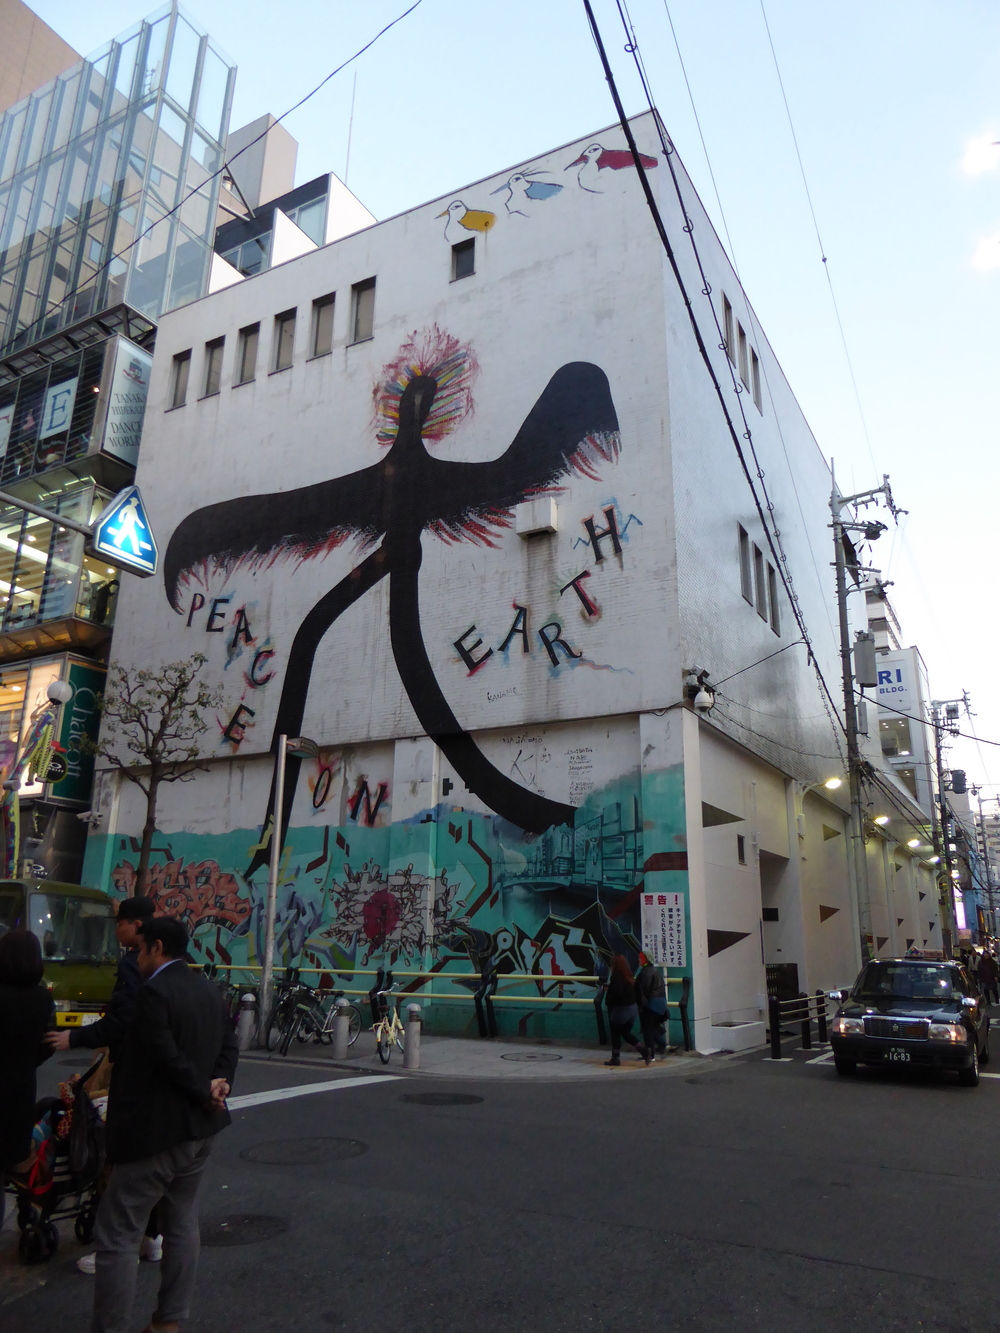 Amemura-Shinsaibashi neighborhood with lots of vintage shops